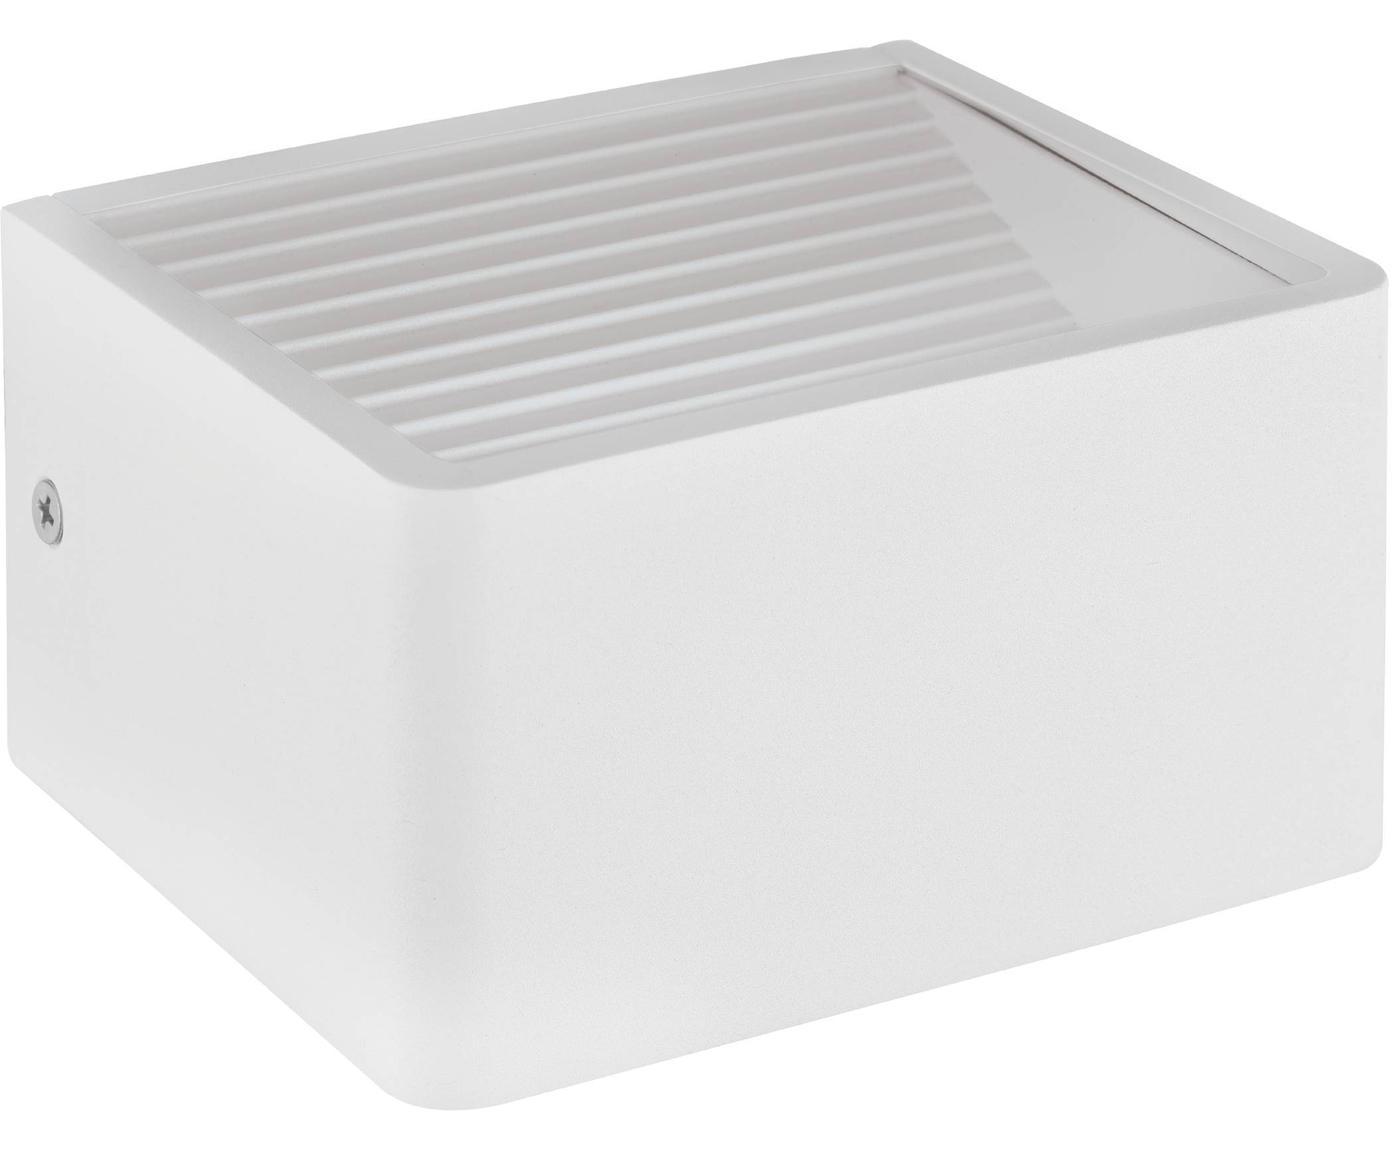 Aplique LED para exterior Doninni, Estructura: aluminio, Blanco, An 14 x F 8 cm